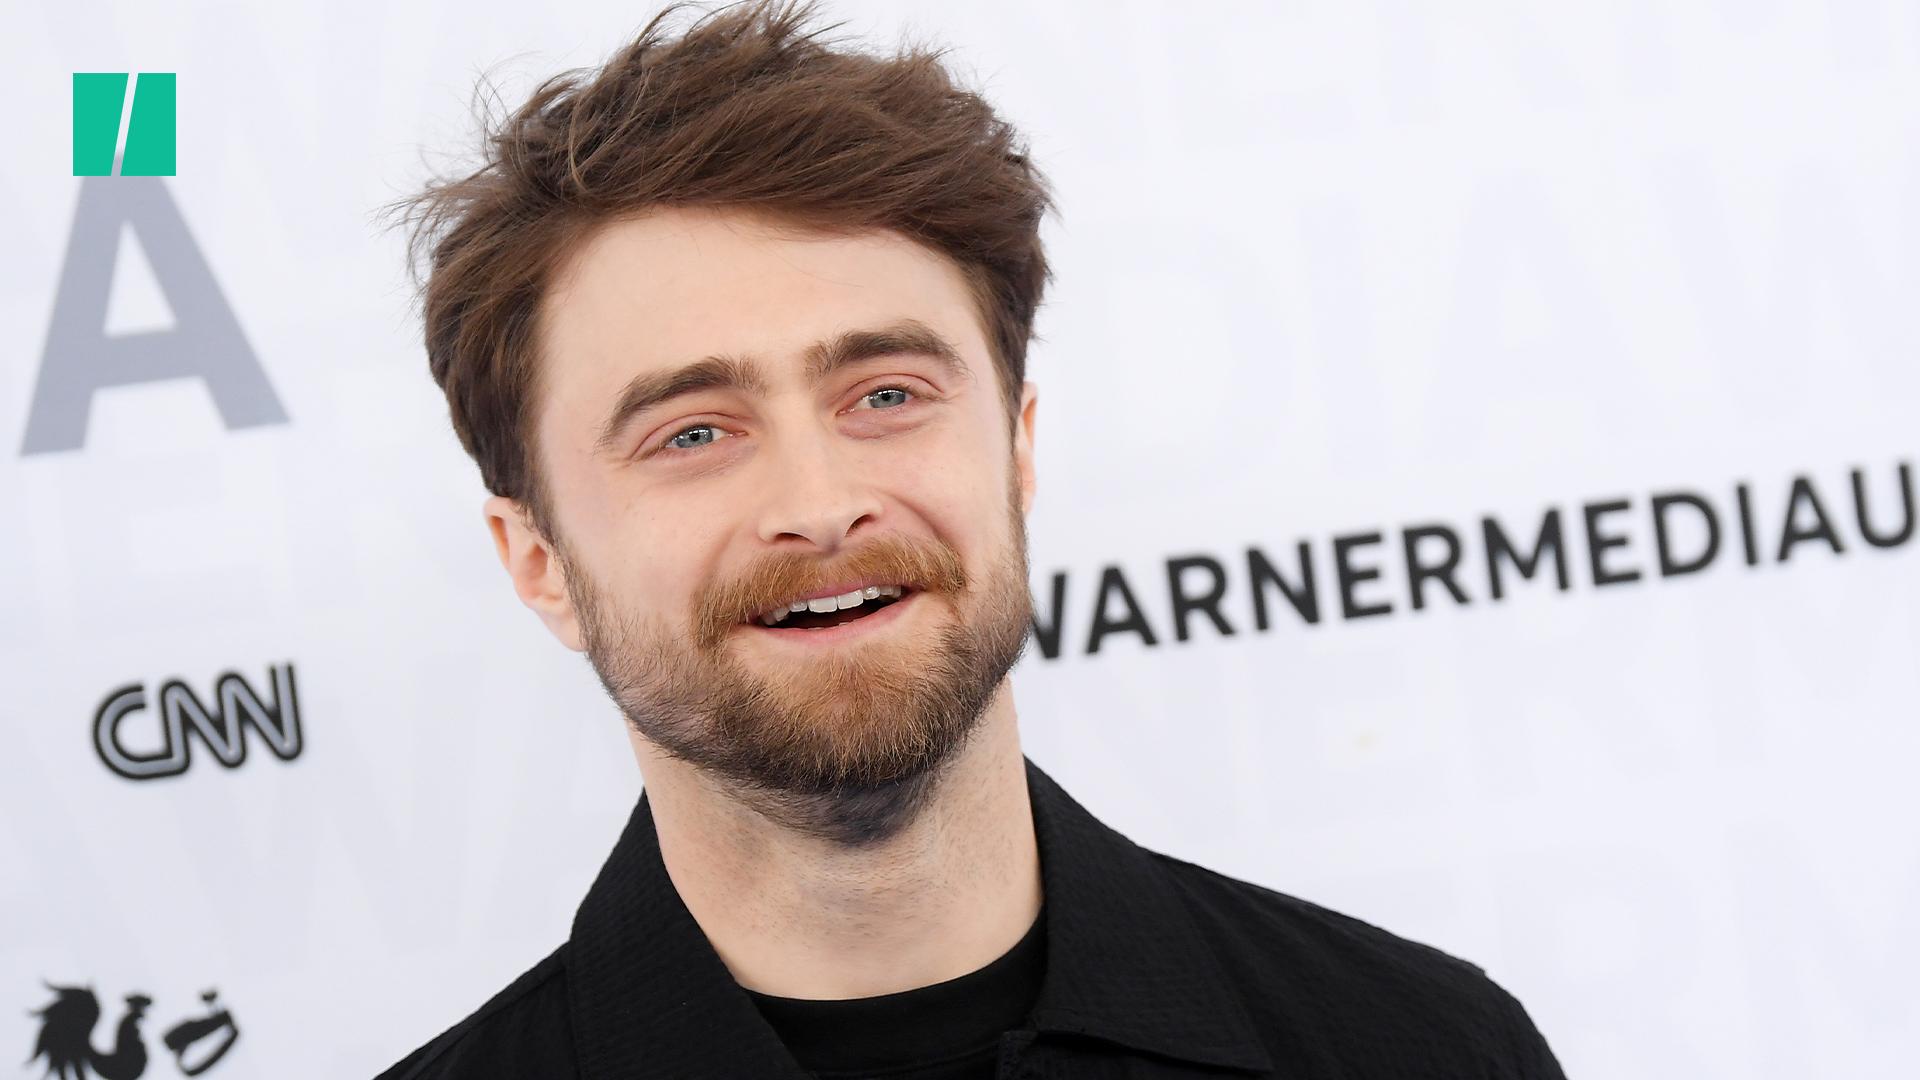 Daniel Radcliffe Turns 30